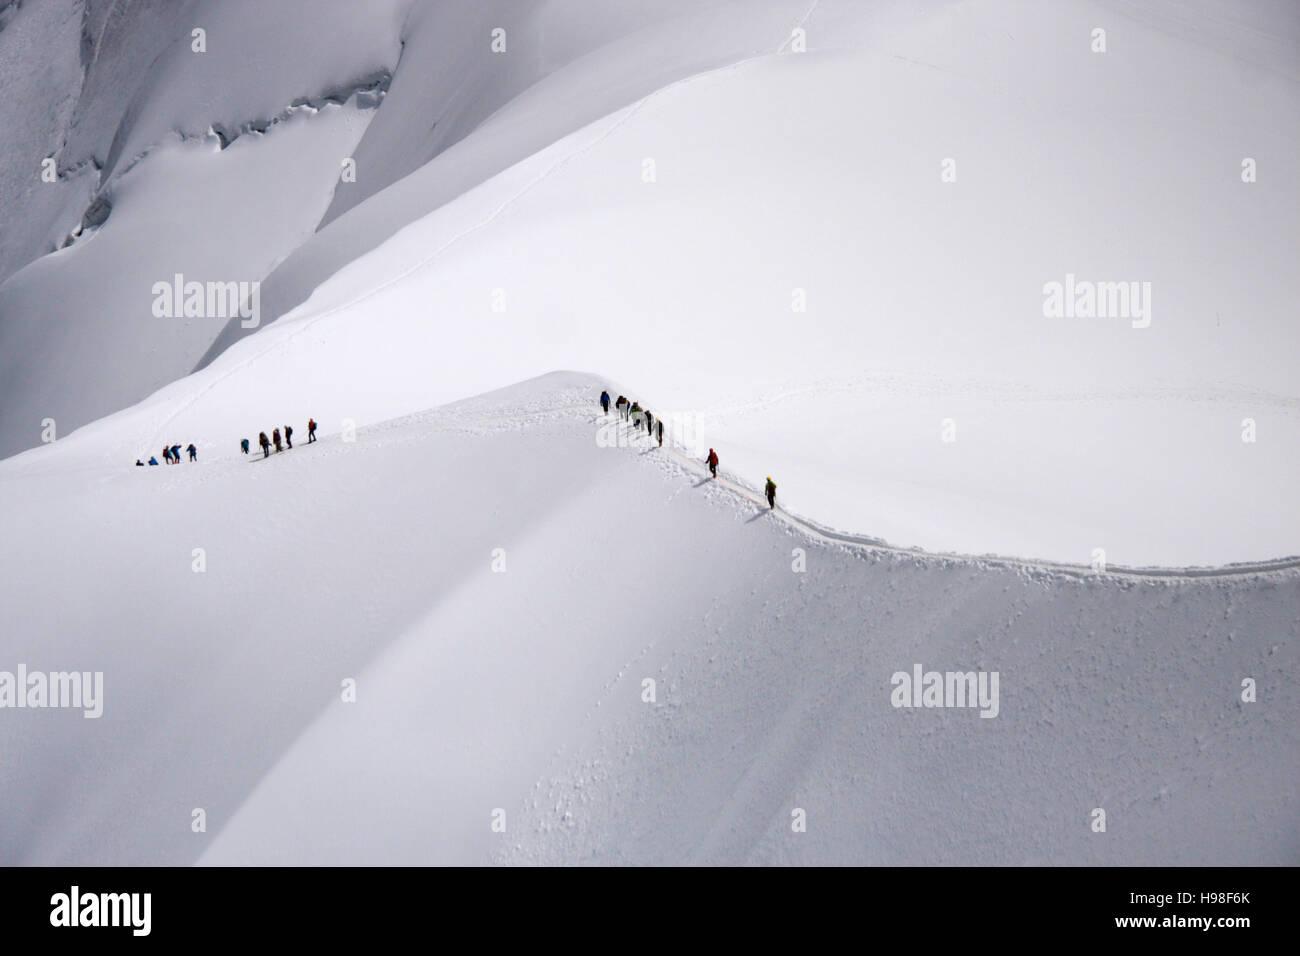 Bergsteiger, Mont Blanc-Massiv, Chamonix, Frankreich. Stock Photo